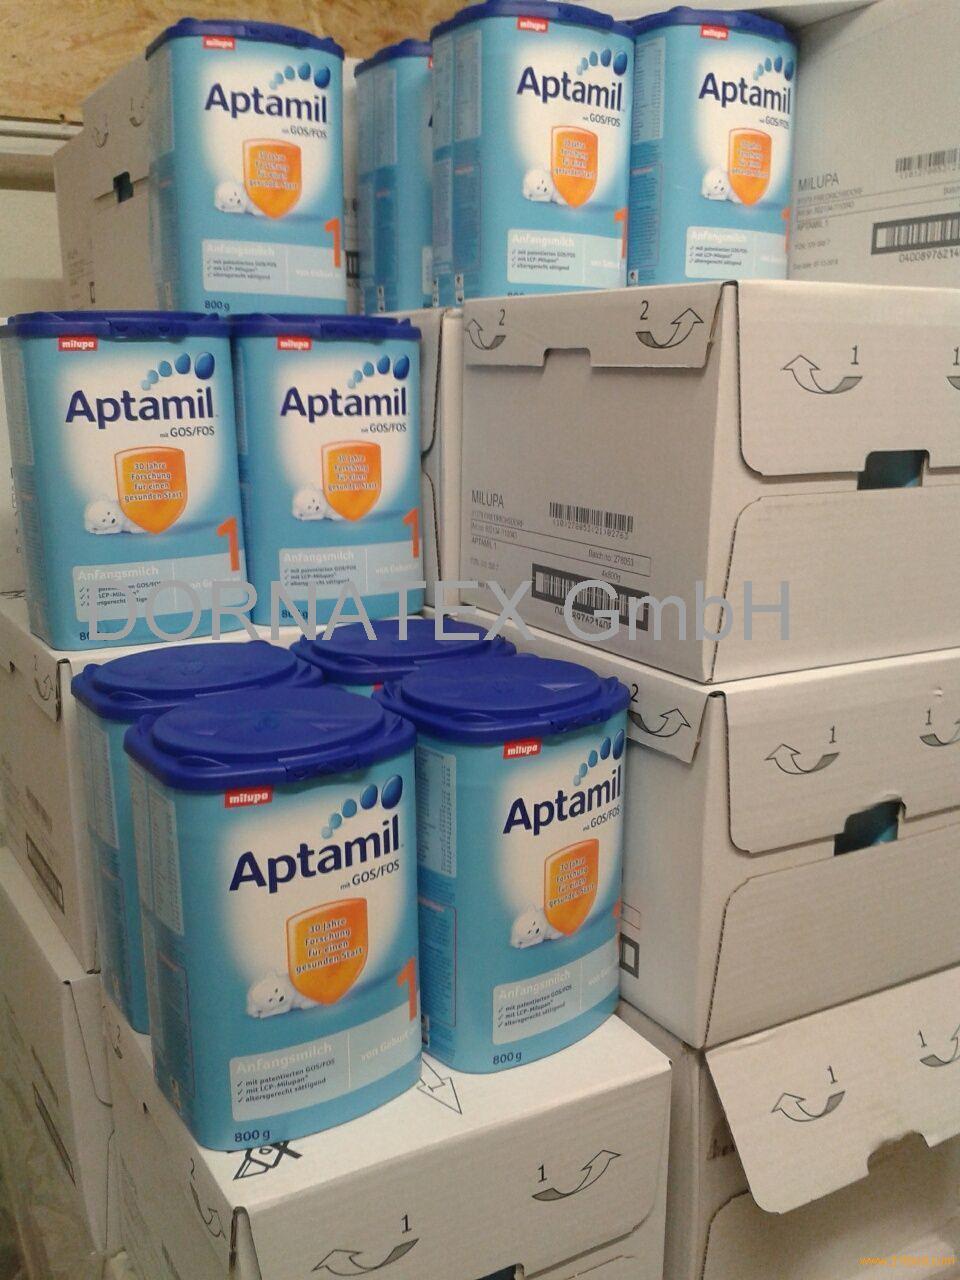 Aptamil,Nutrilon,Hipp,Holle, Friso, SMA, Cow & Gate,Nestle Nido,Bebvita Infant Milk Powder.